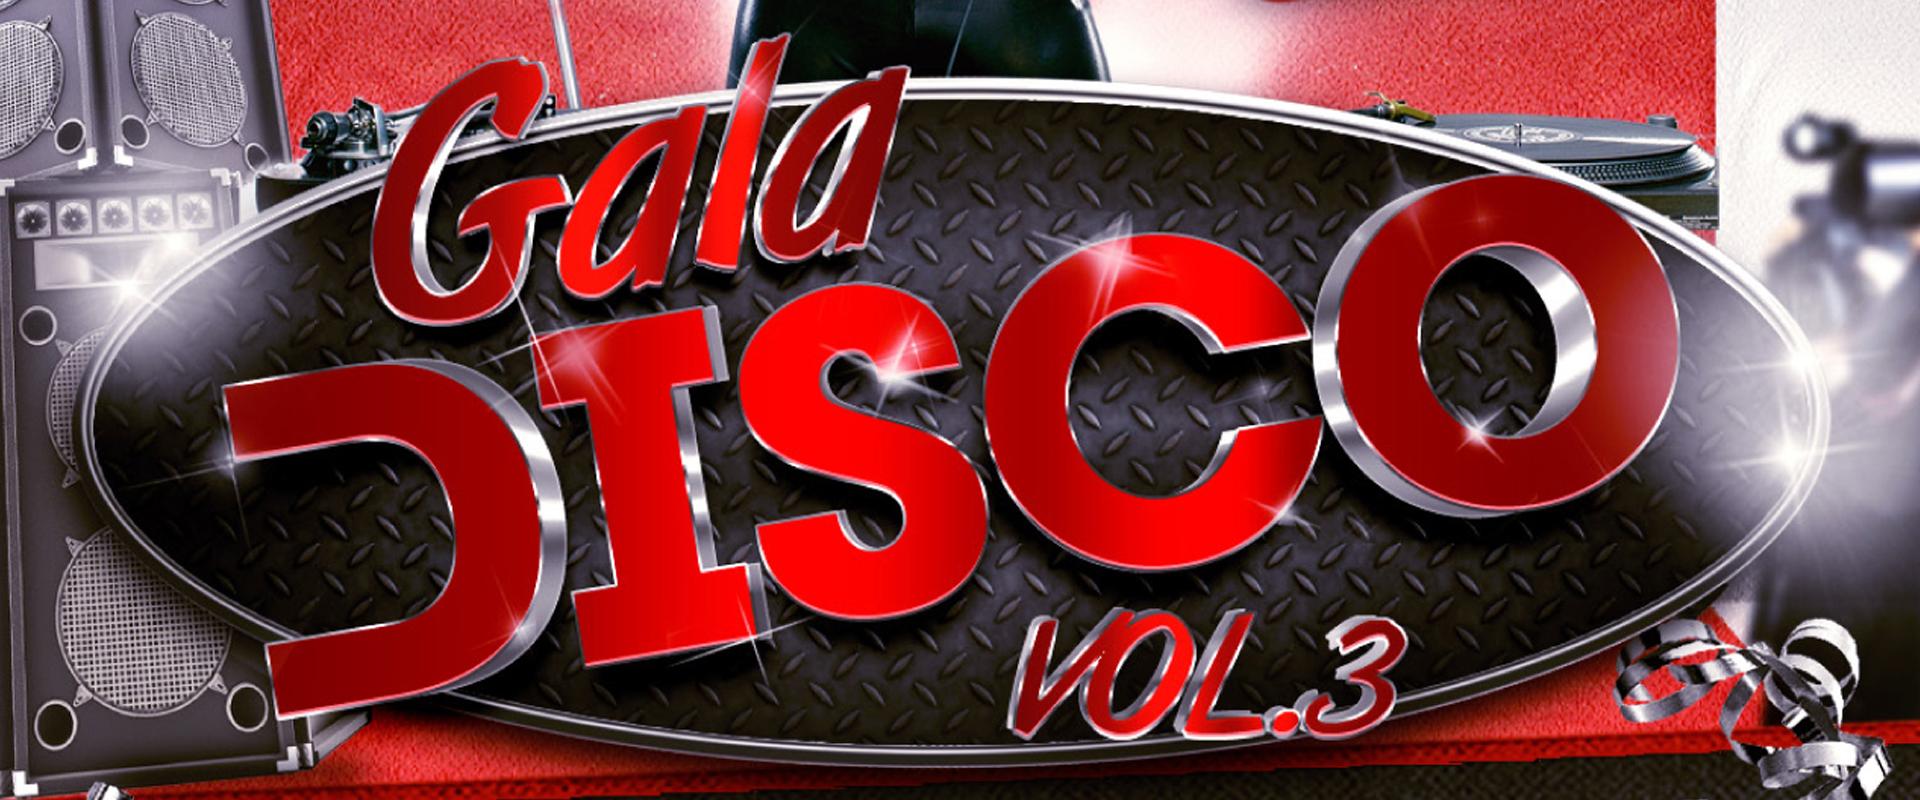 gala-disco-3